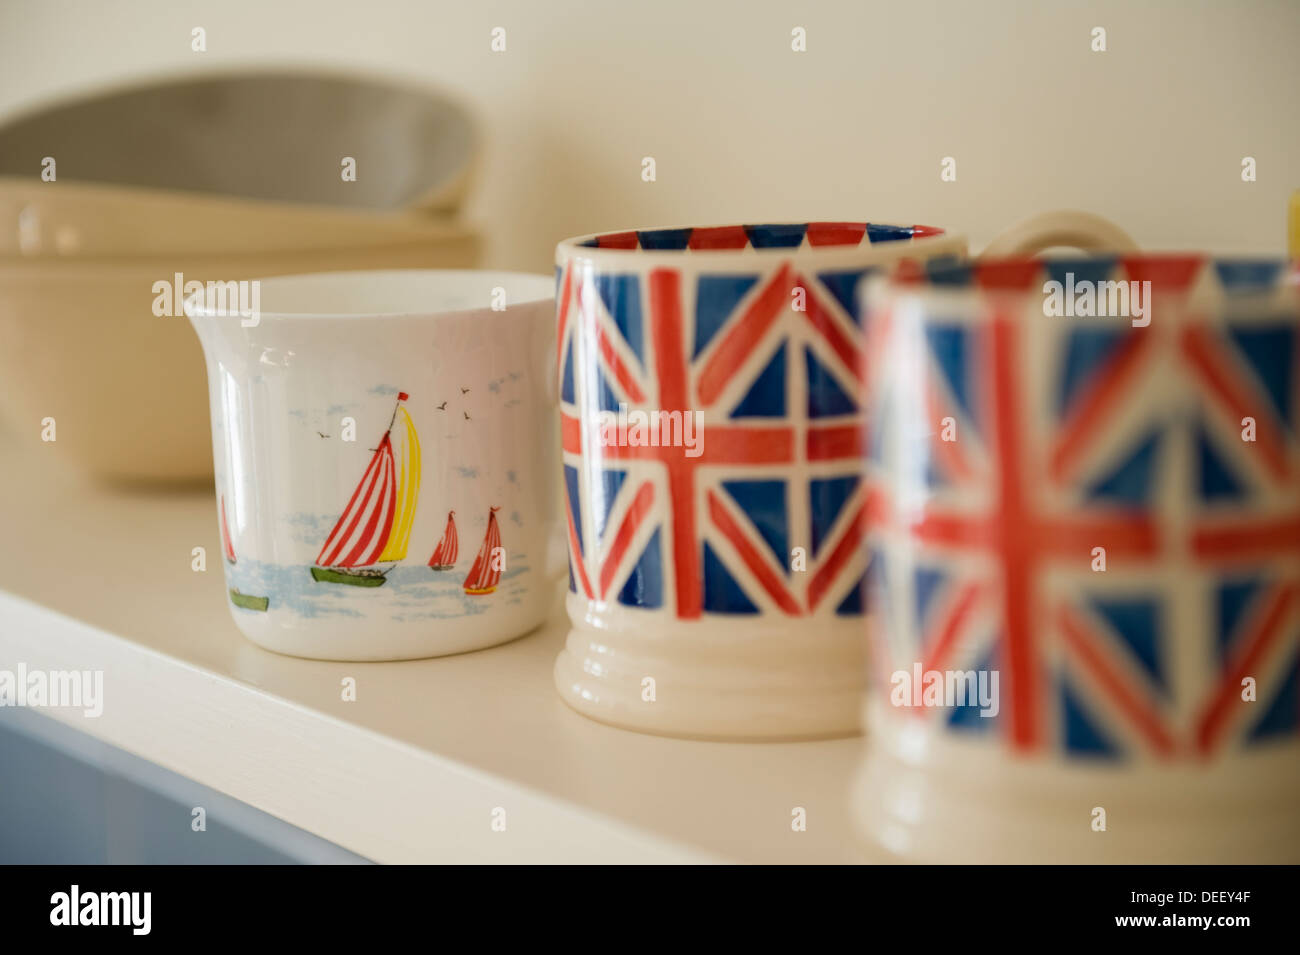 Union Jack cups by Emma Bridgewater - Stock Image